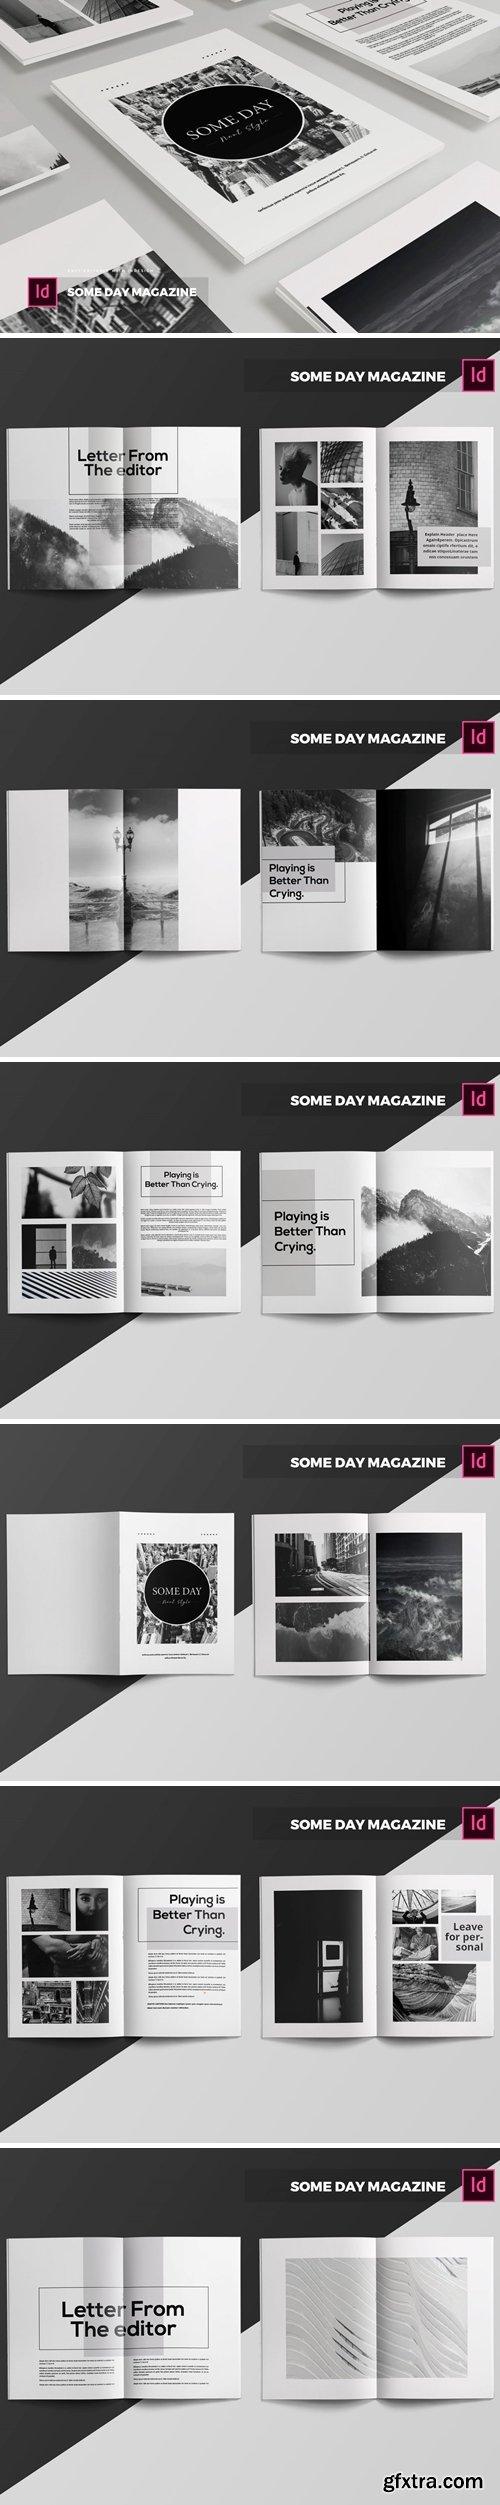 Someday   Magazine Template